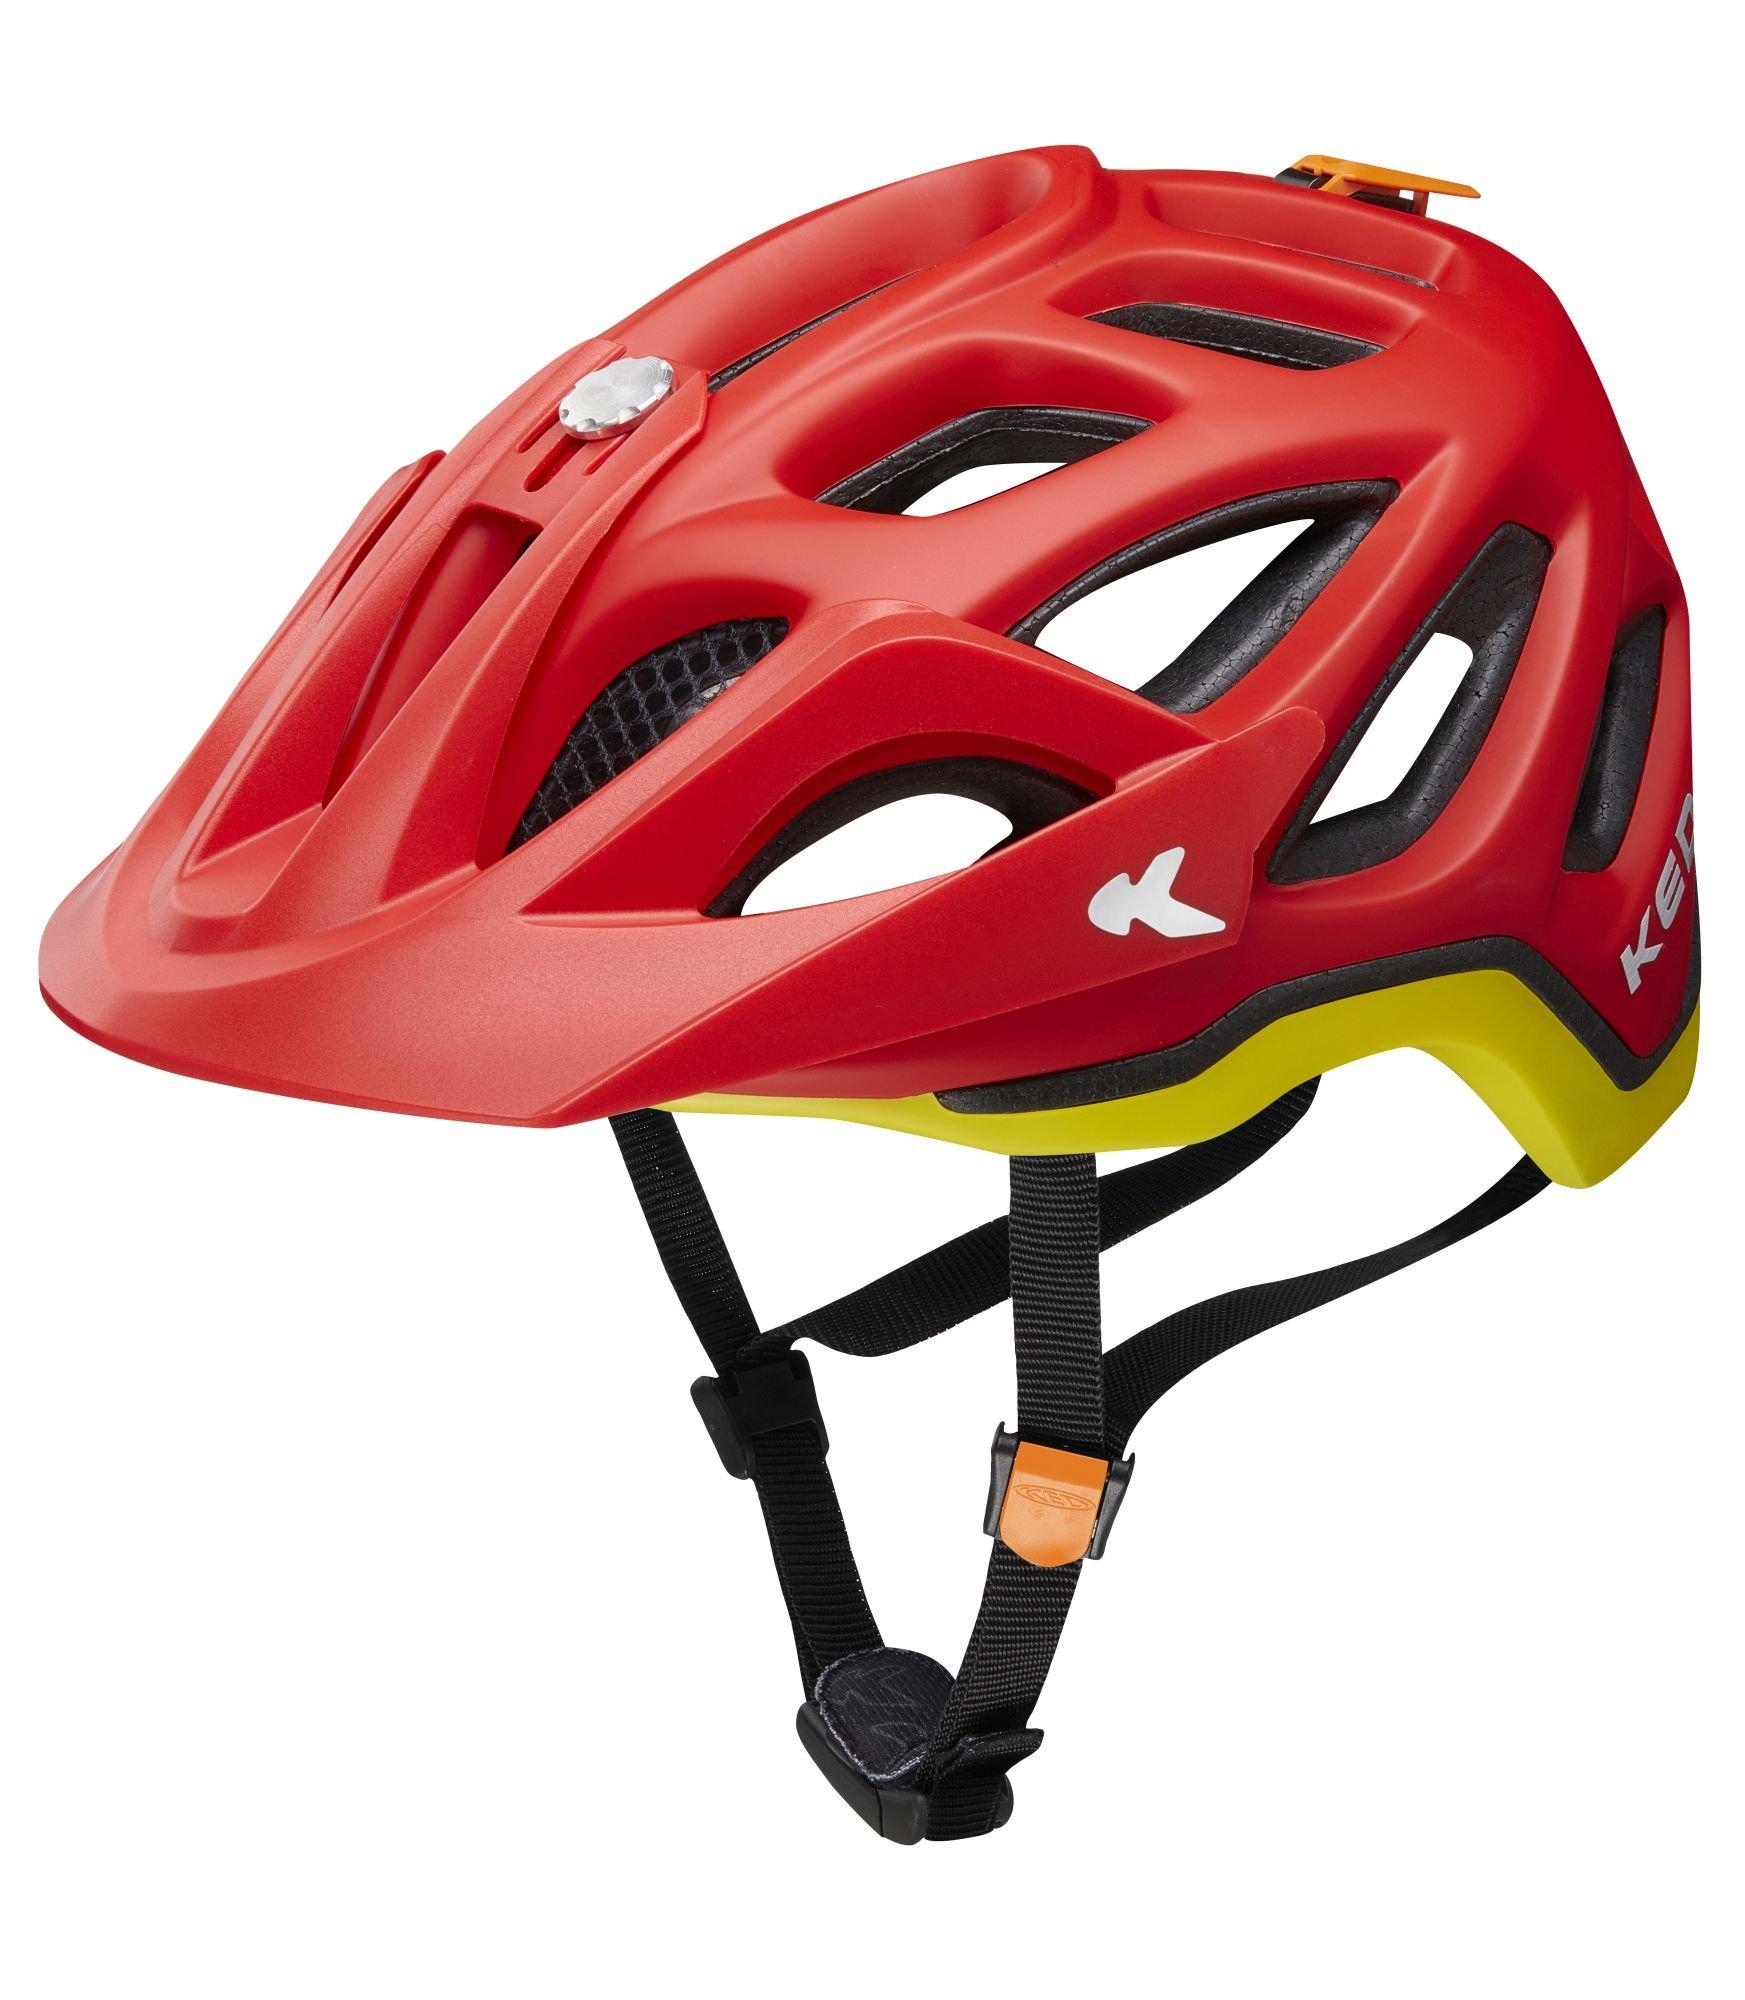 mountainbike-helme/Helme: KED  Fahrradhelm Trailon 52-58 cm